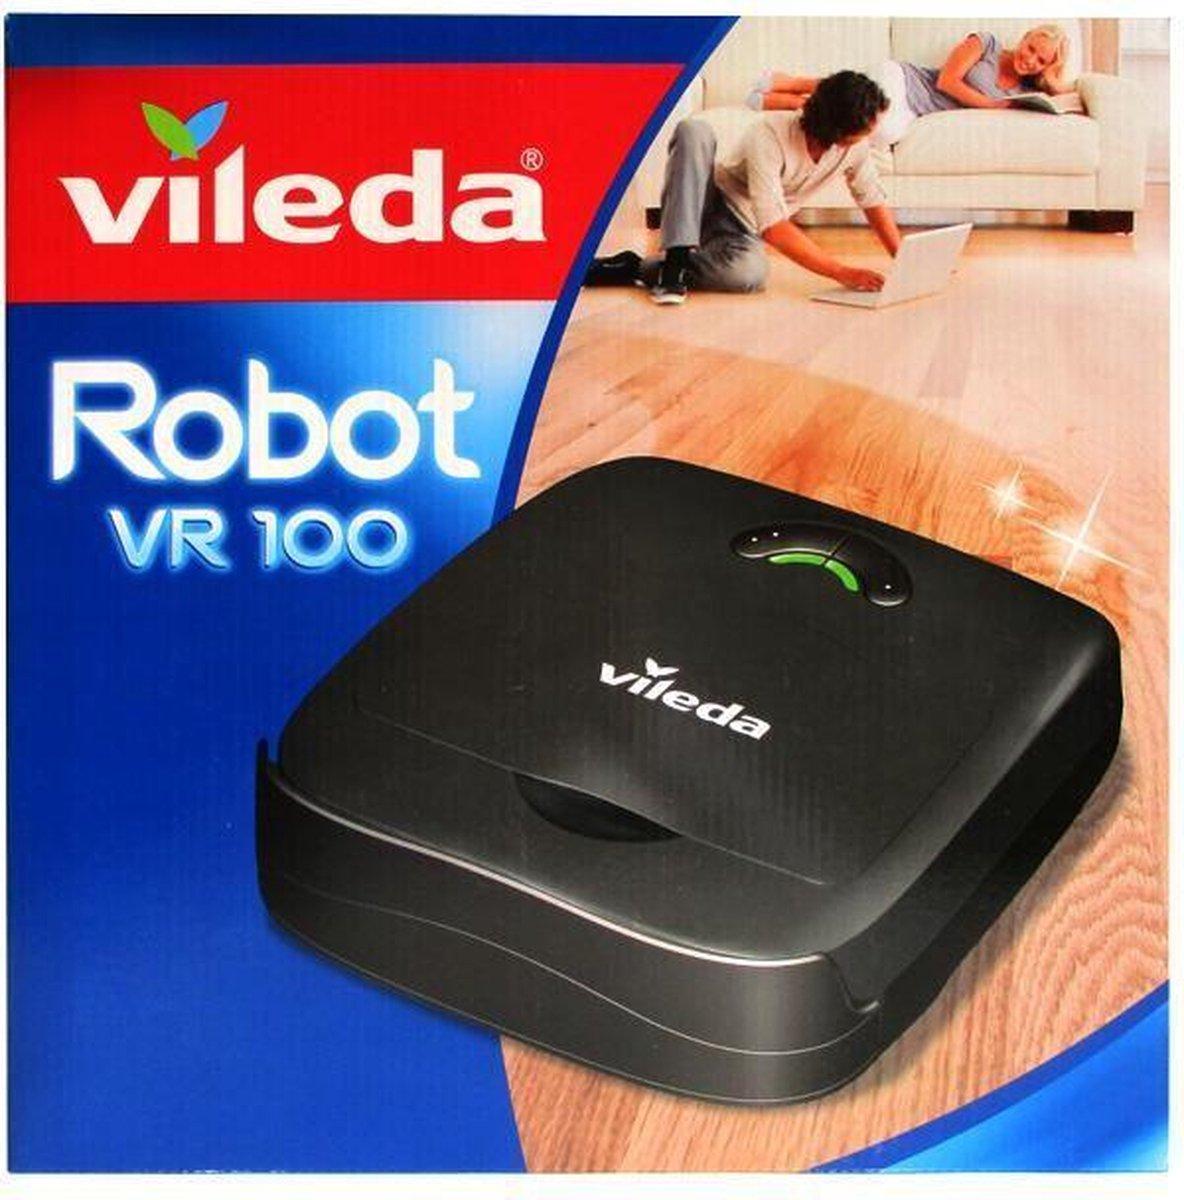 Vileda VR 102 Robotstofzuiger Kijkshop